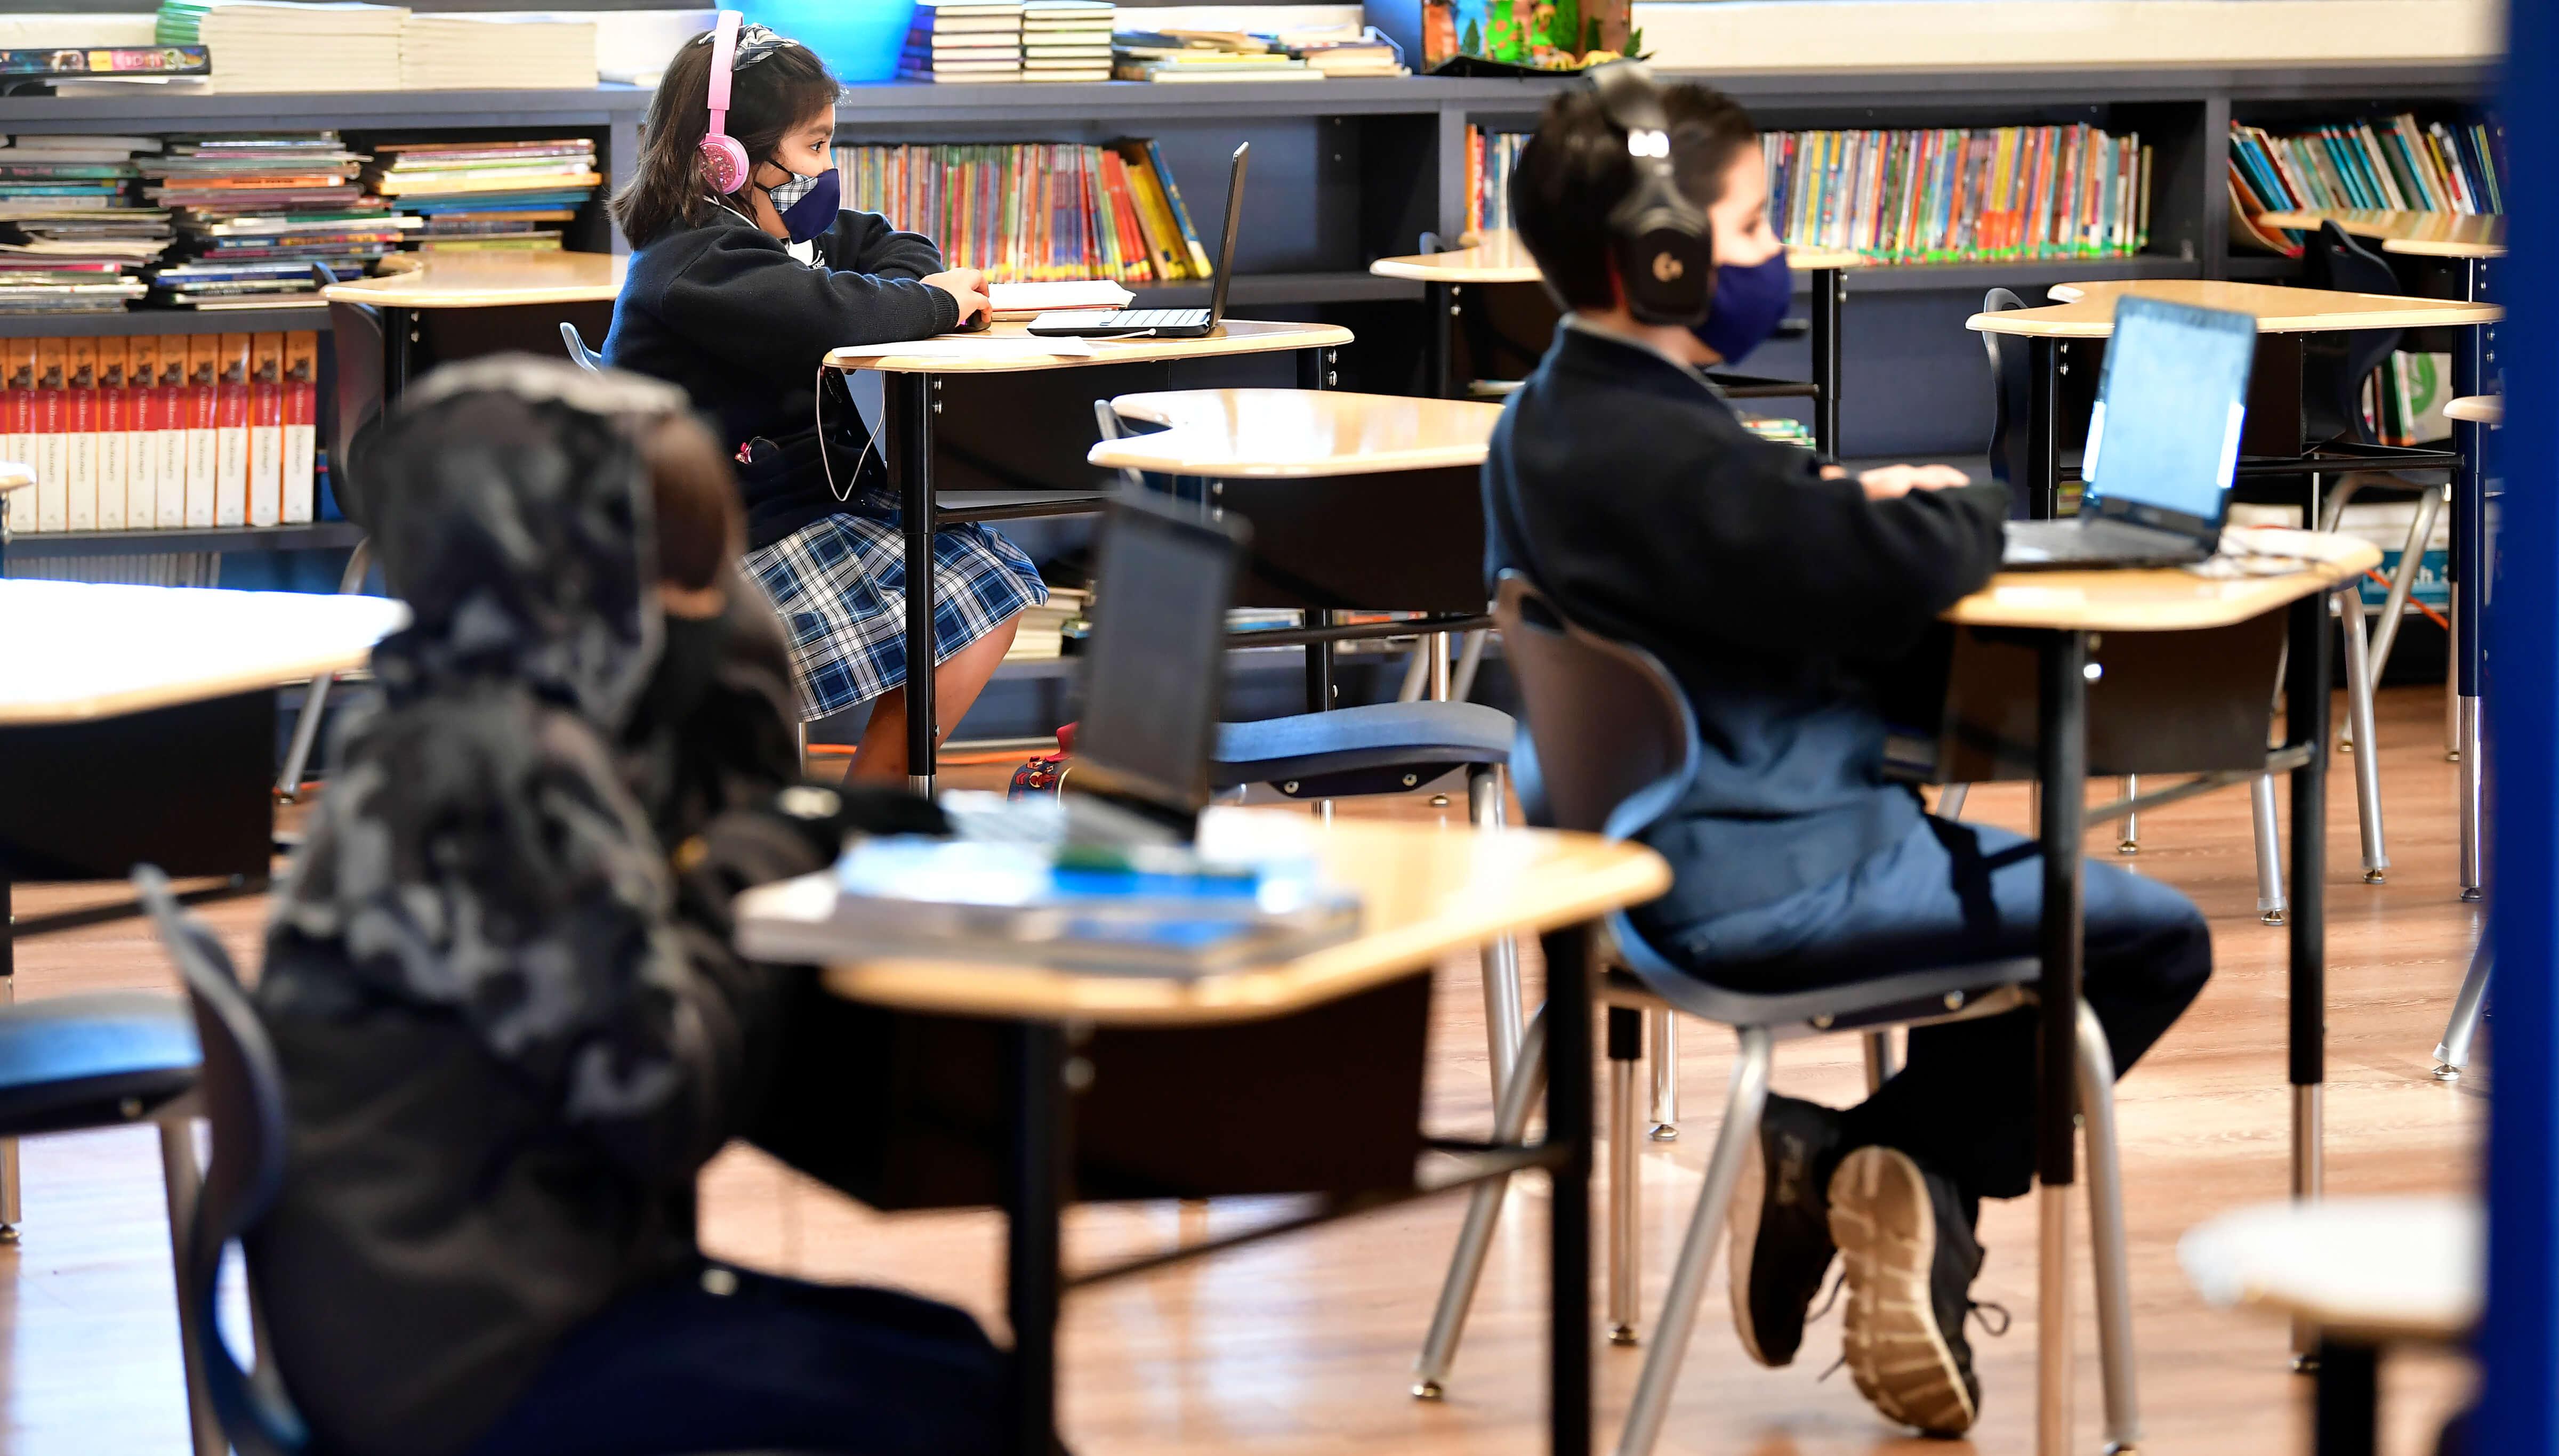 Rapid Covid spread not seen in several studies of schools